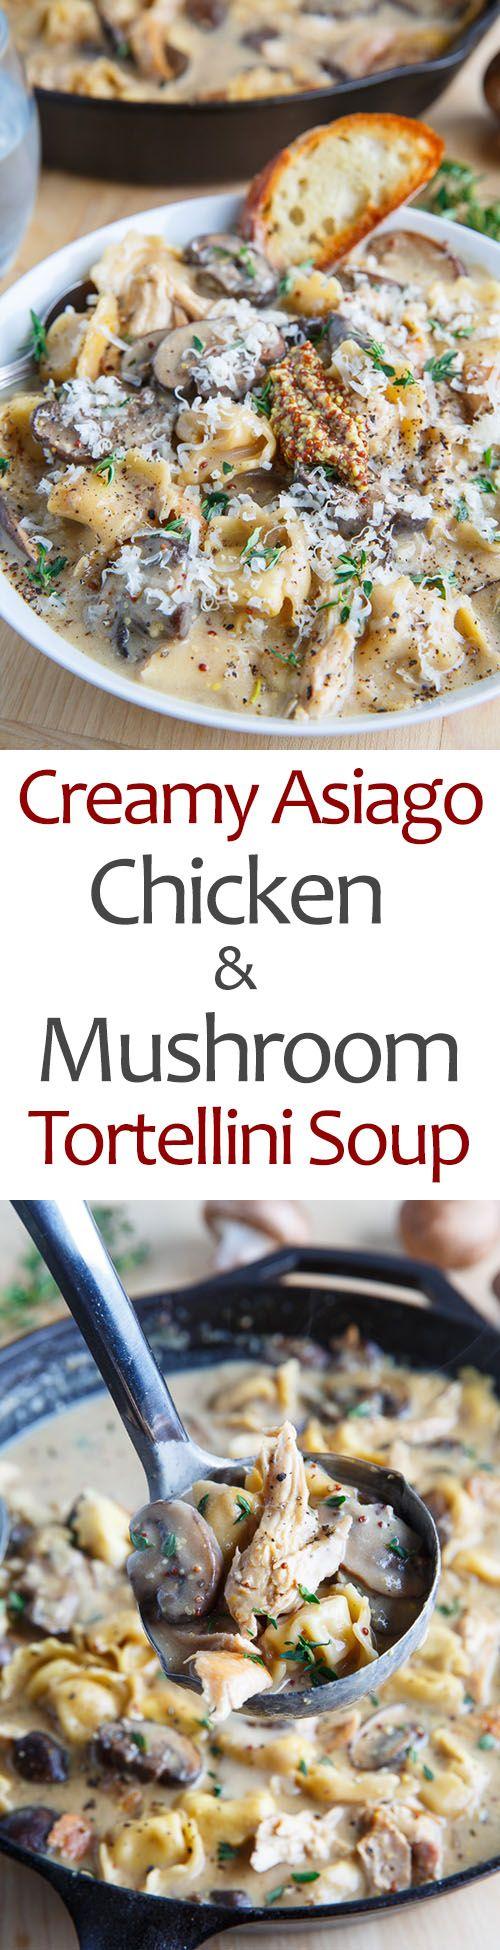 Creamy Asiago Chicken & Mushroom Tortellini Soup